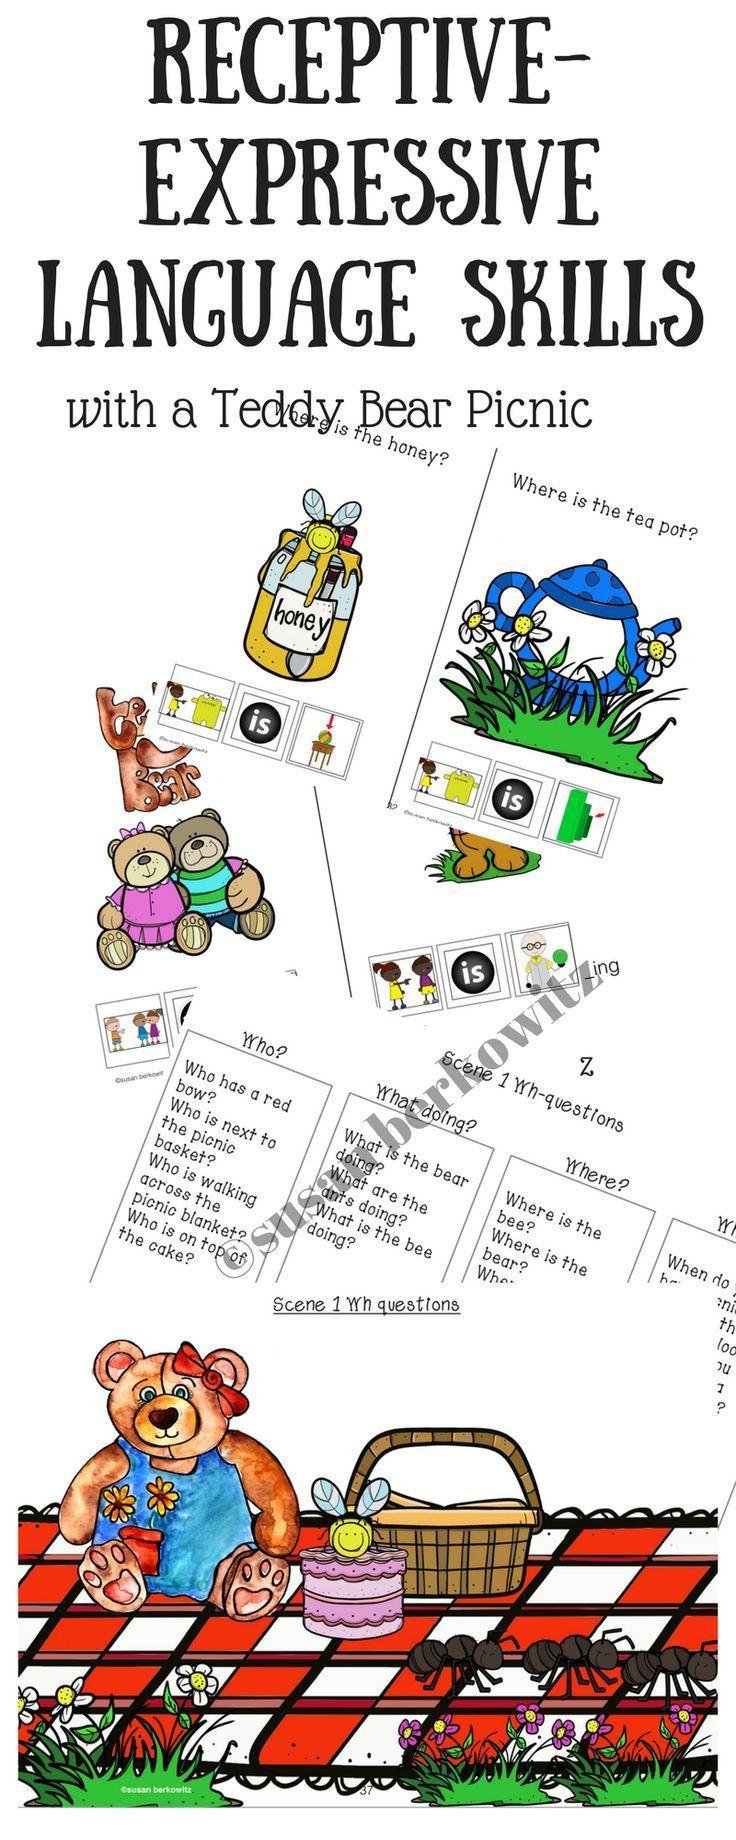 Teddy Bear Picnic Receptive And Expressive Language Skills Expressive Language Phrases And Sentences Language